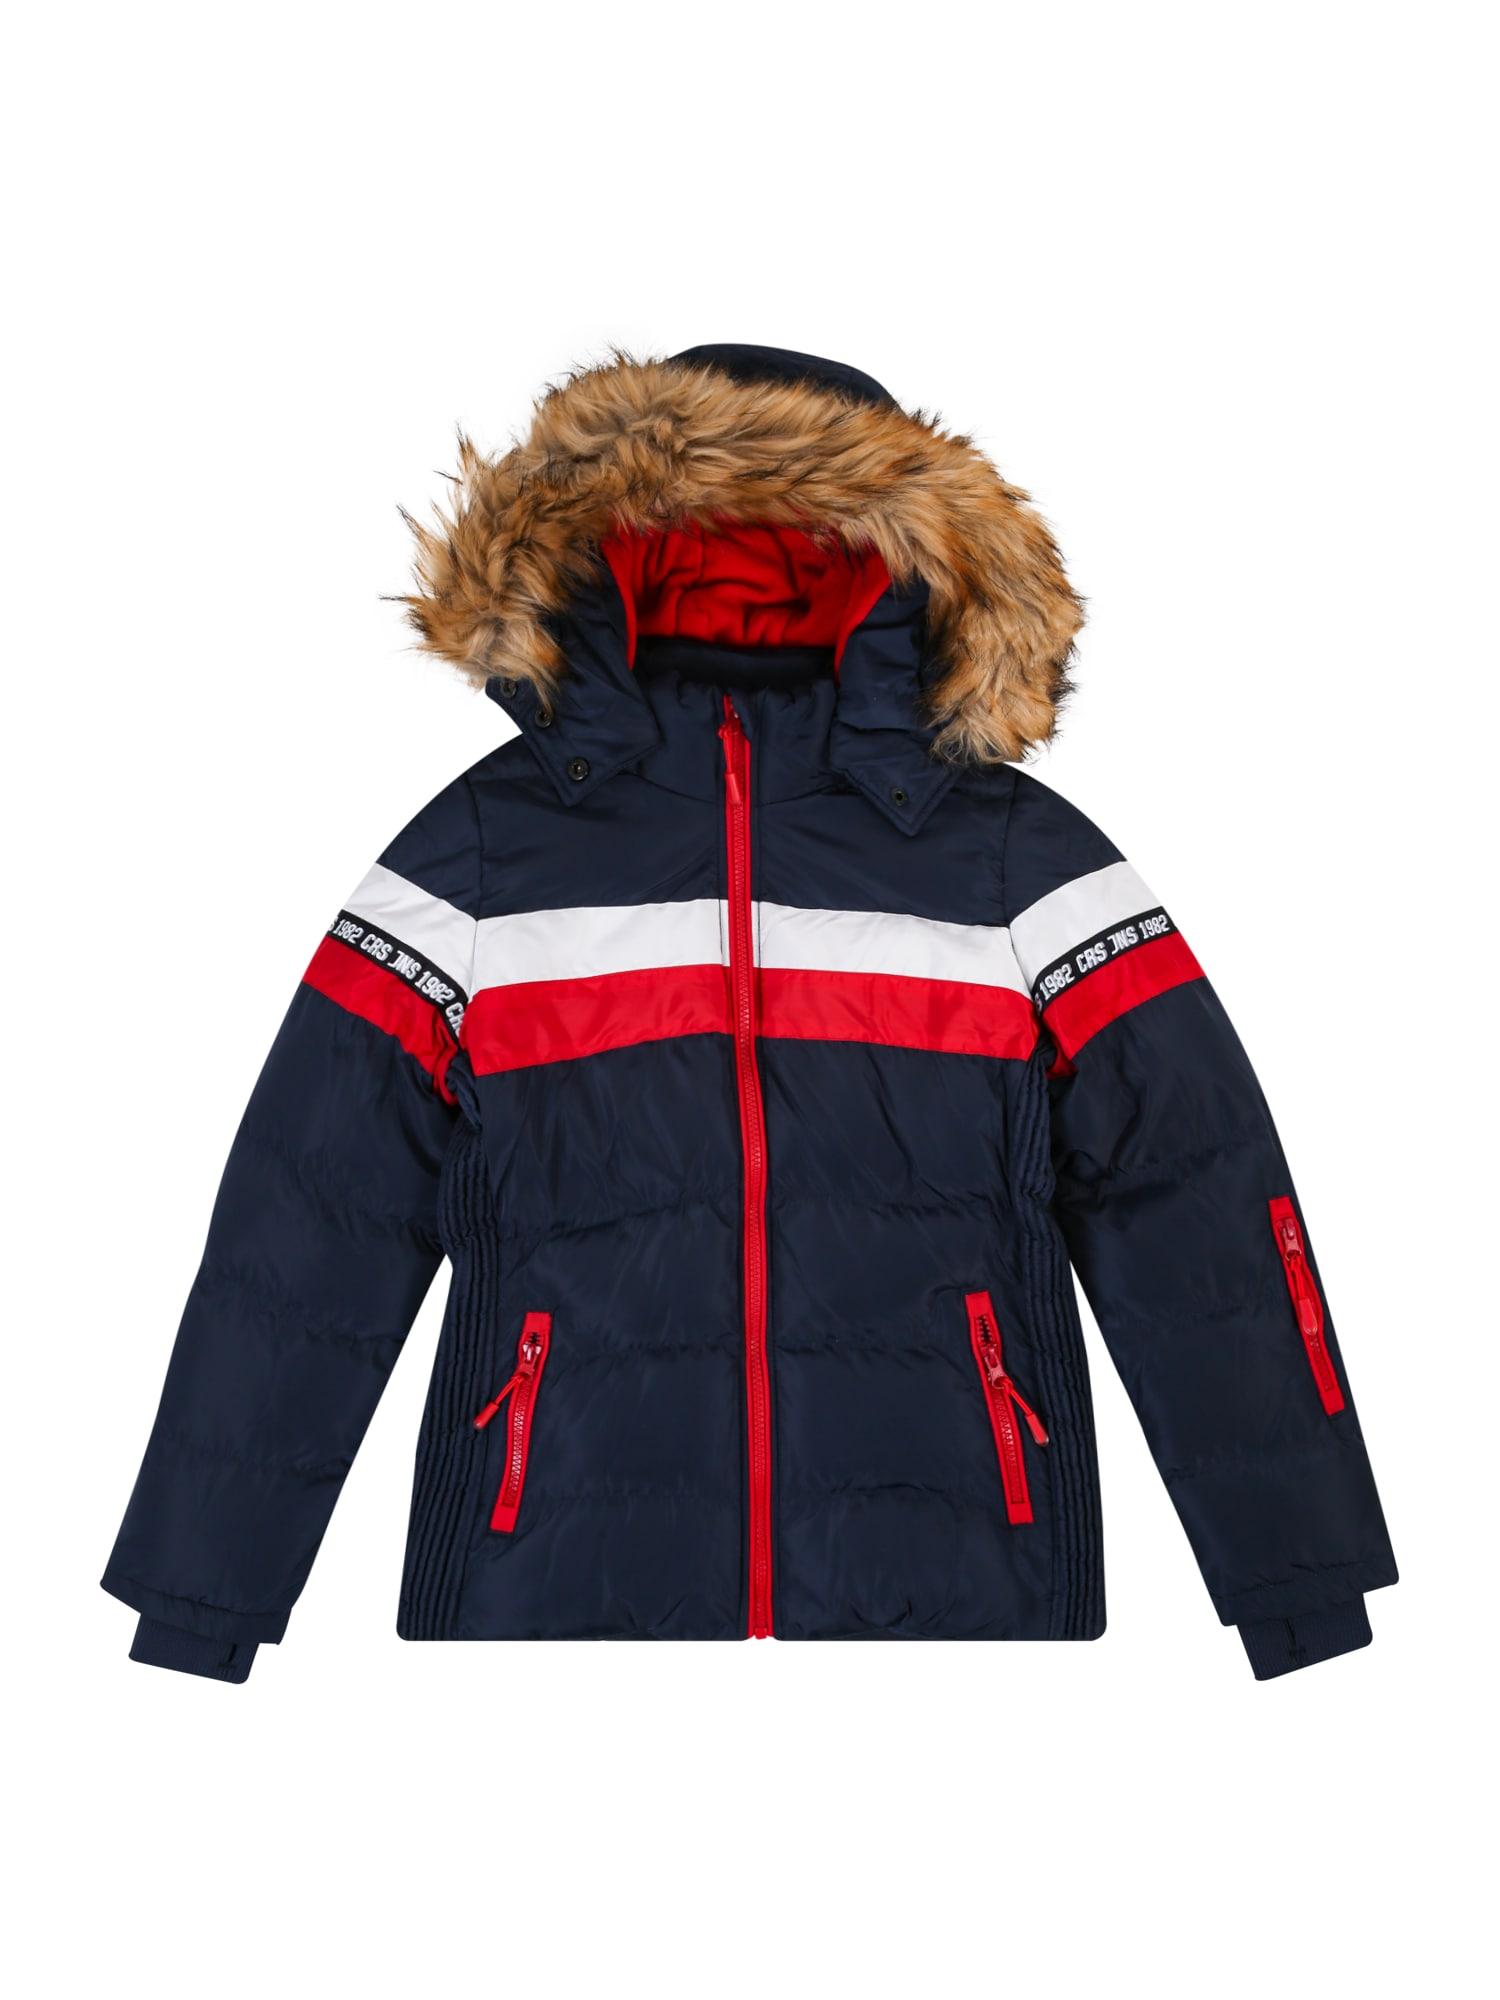 Cars Jeans Žieminė striukė 'KIDS NOVALIE POLY' tamsiai mėlyna / raudona